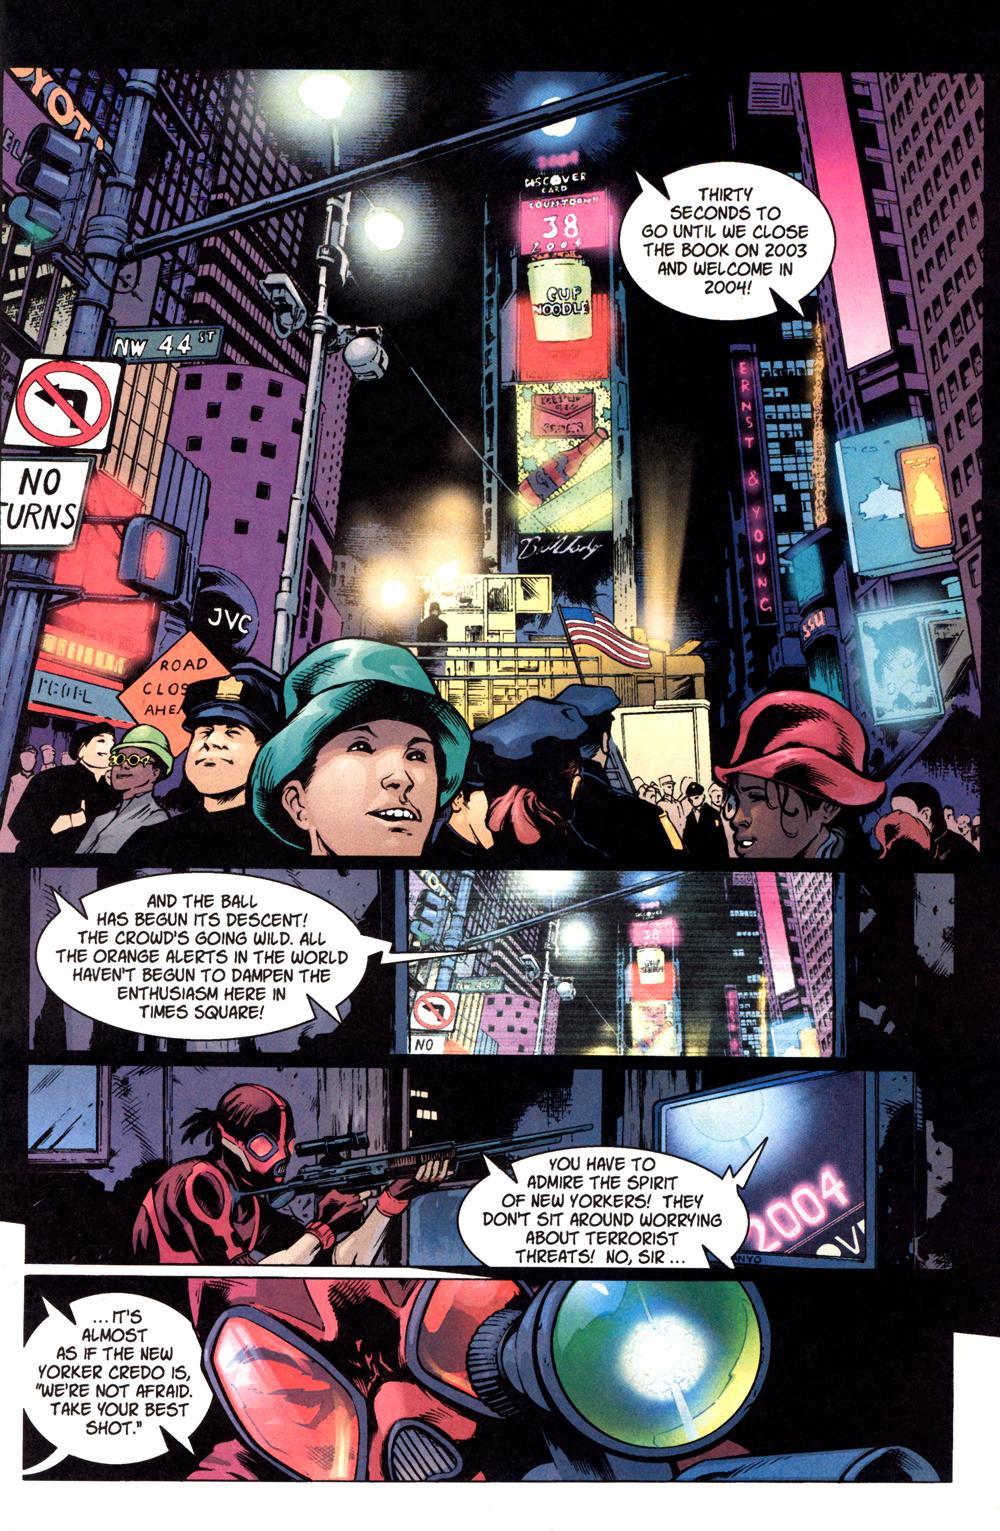 Read online SpyBoy: Final Exam comic -  Issue #1 - 3